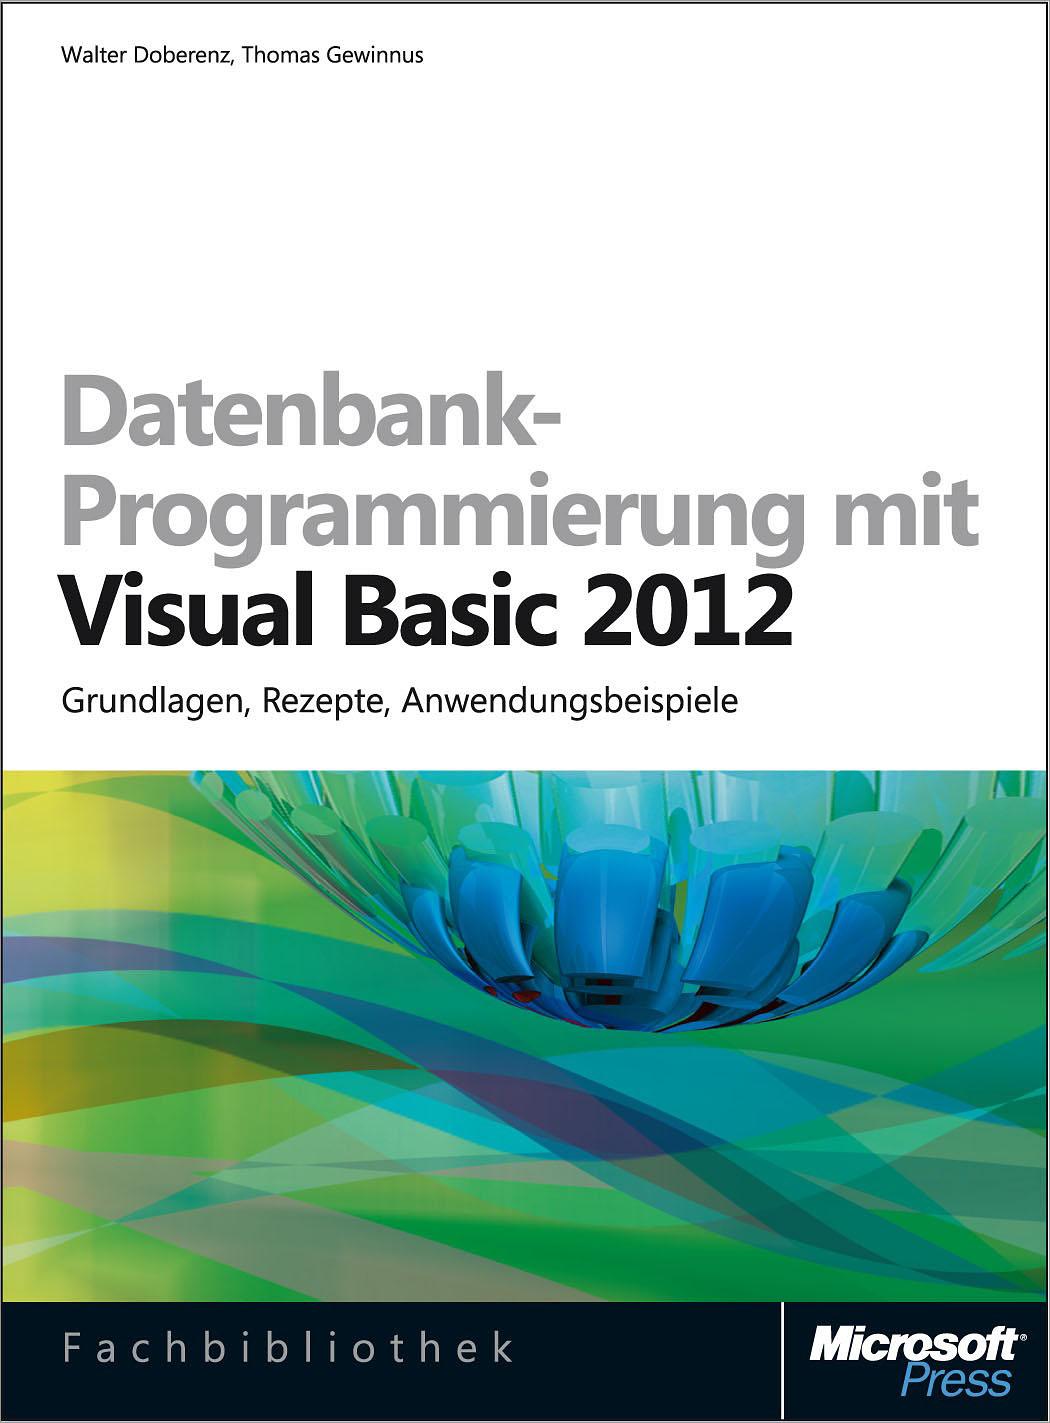 Walter Doberenz Datenbank-Programmierung mit Visual Basic 2012